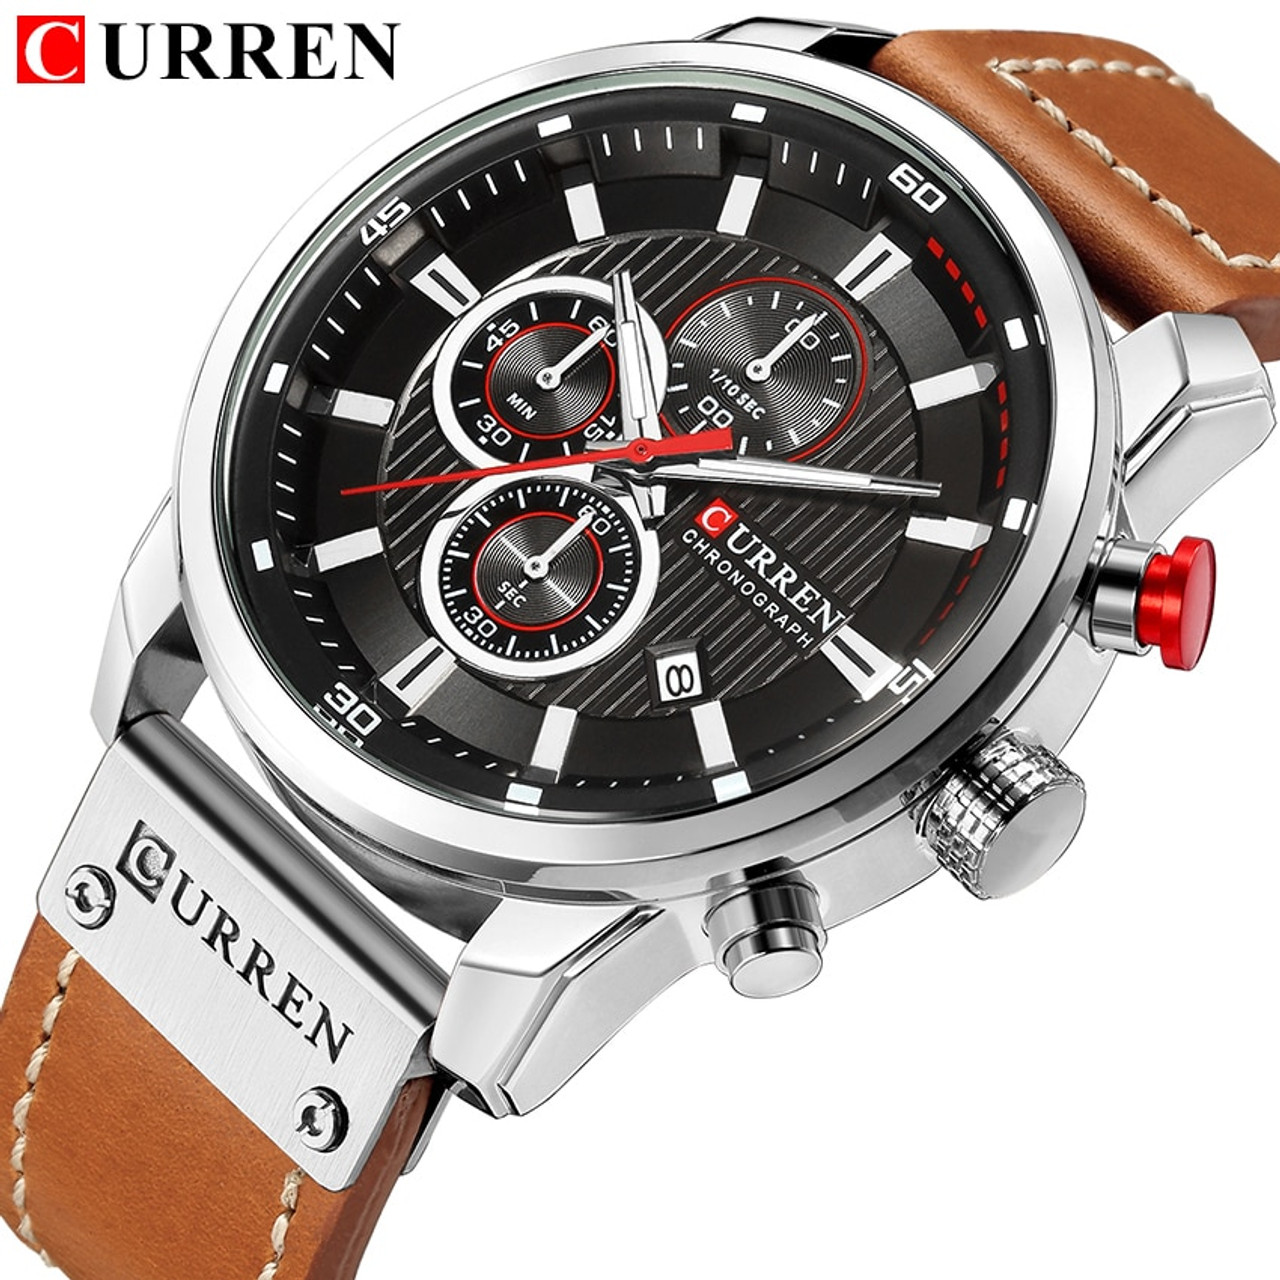 572302a7 CURREN Luxury Brand Men Military Sport Watches Men's Quartz Clock Leather  Strap Waterproof Date Wristwatch Reloj Hombre